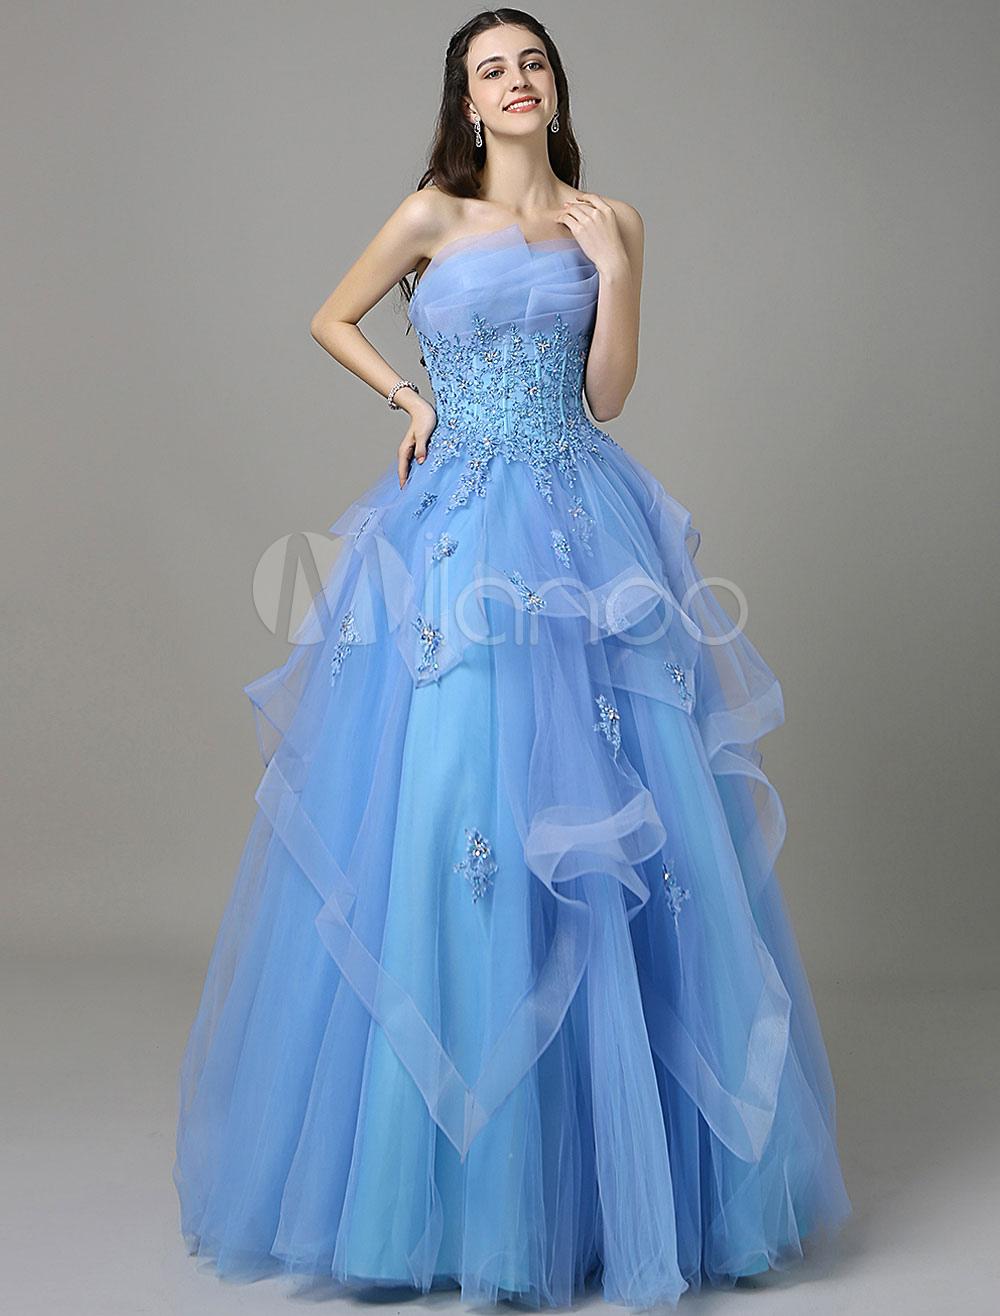 Blue A-Line Prom Dress With Strapless Sleeveless Applique (Wedding Prom Dresses) photo